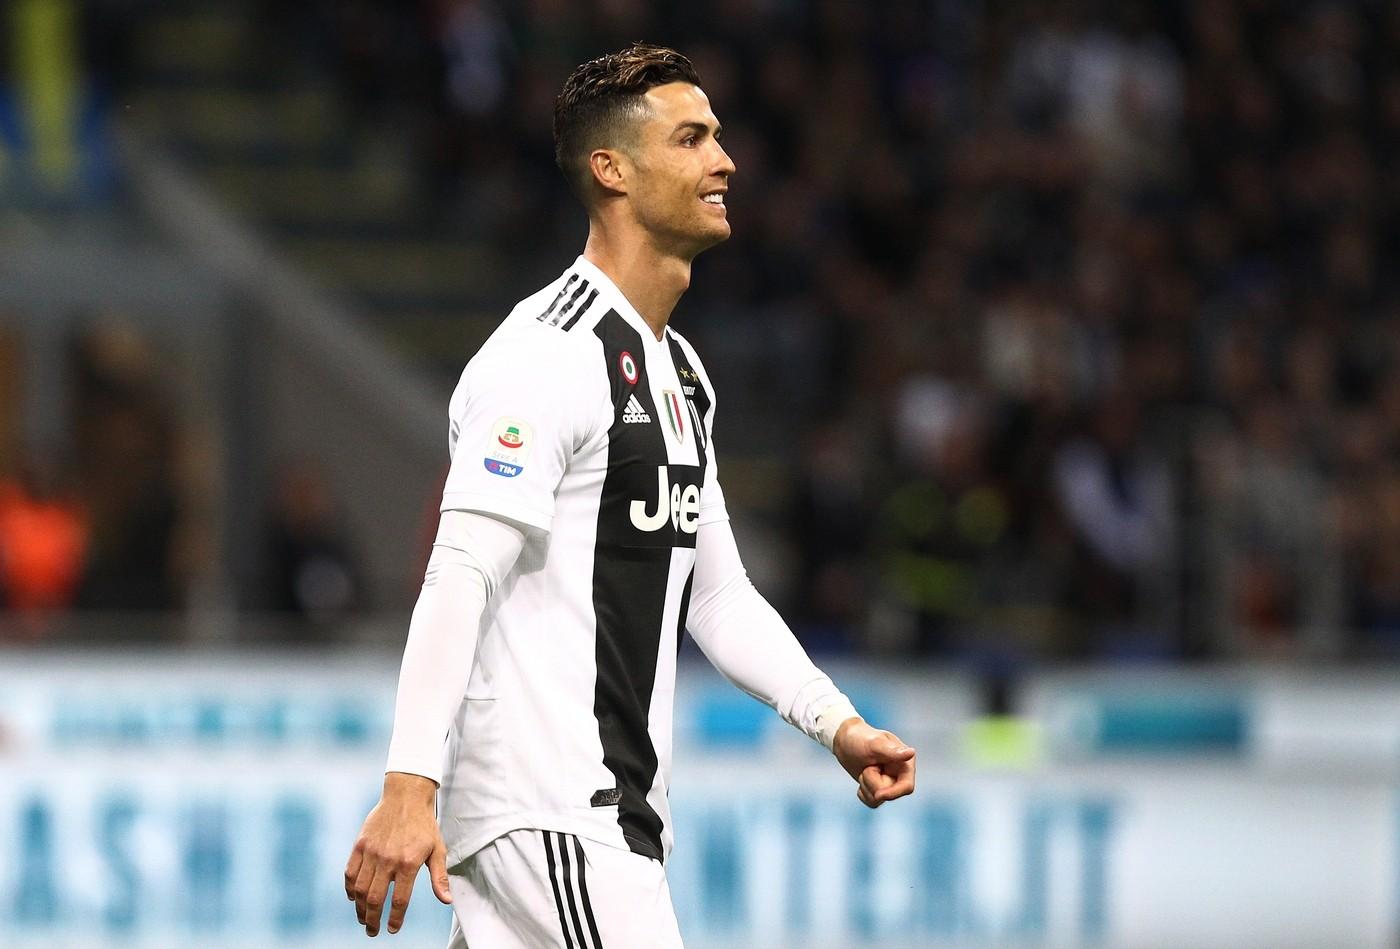 Cristiano Ronaldo (Juventus) Spada/LaPresse